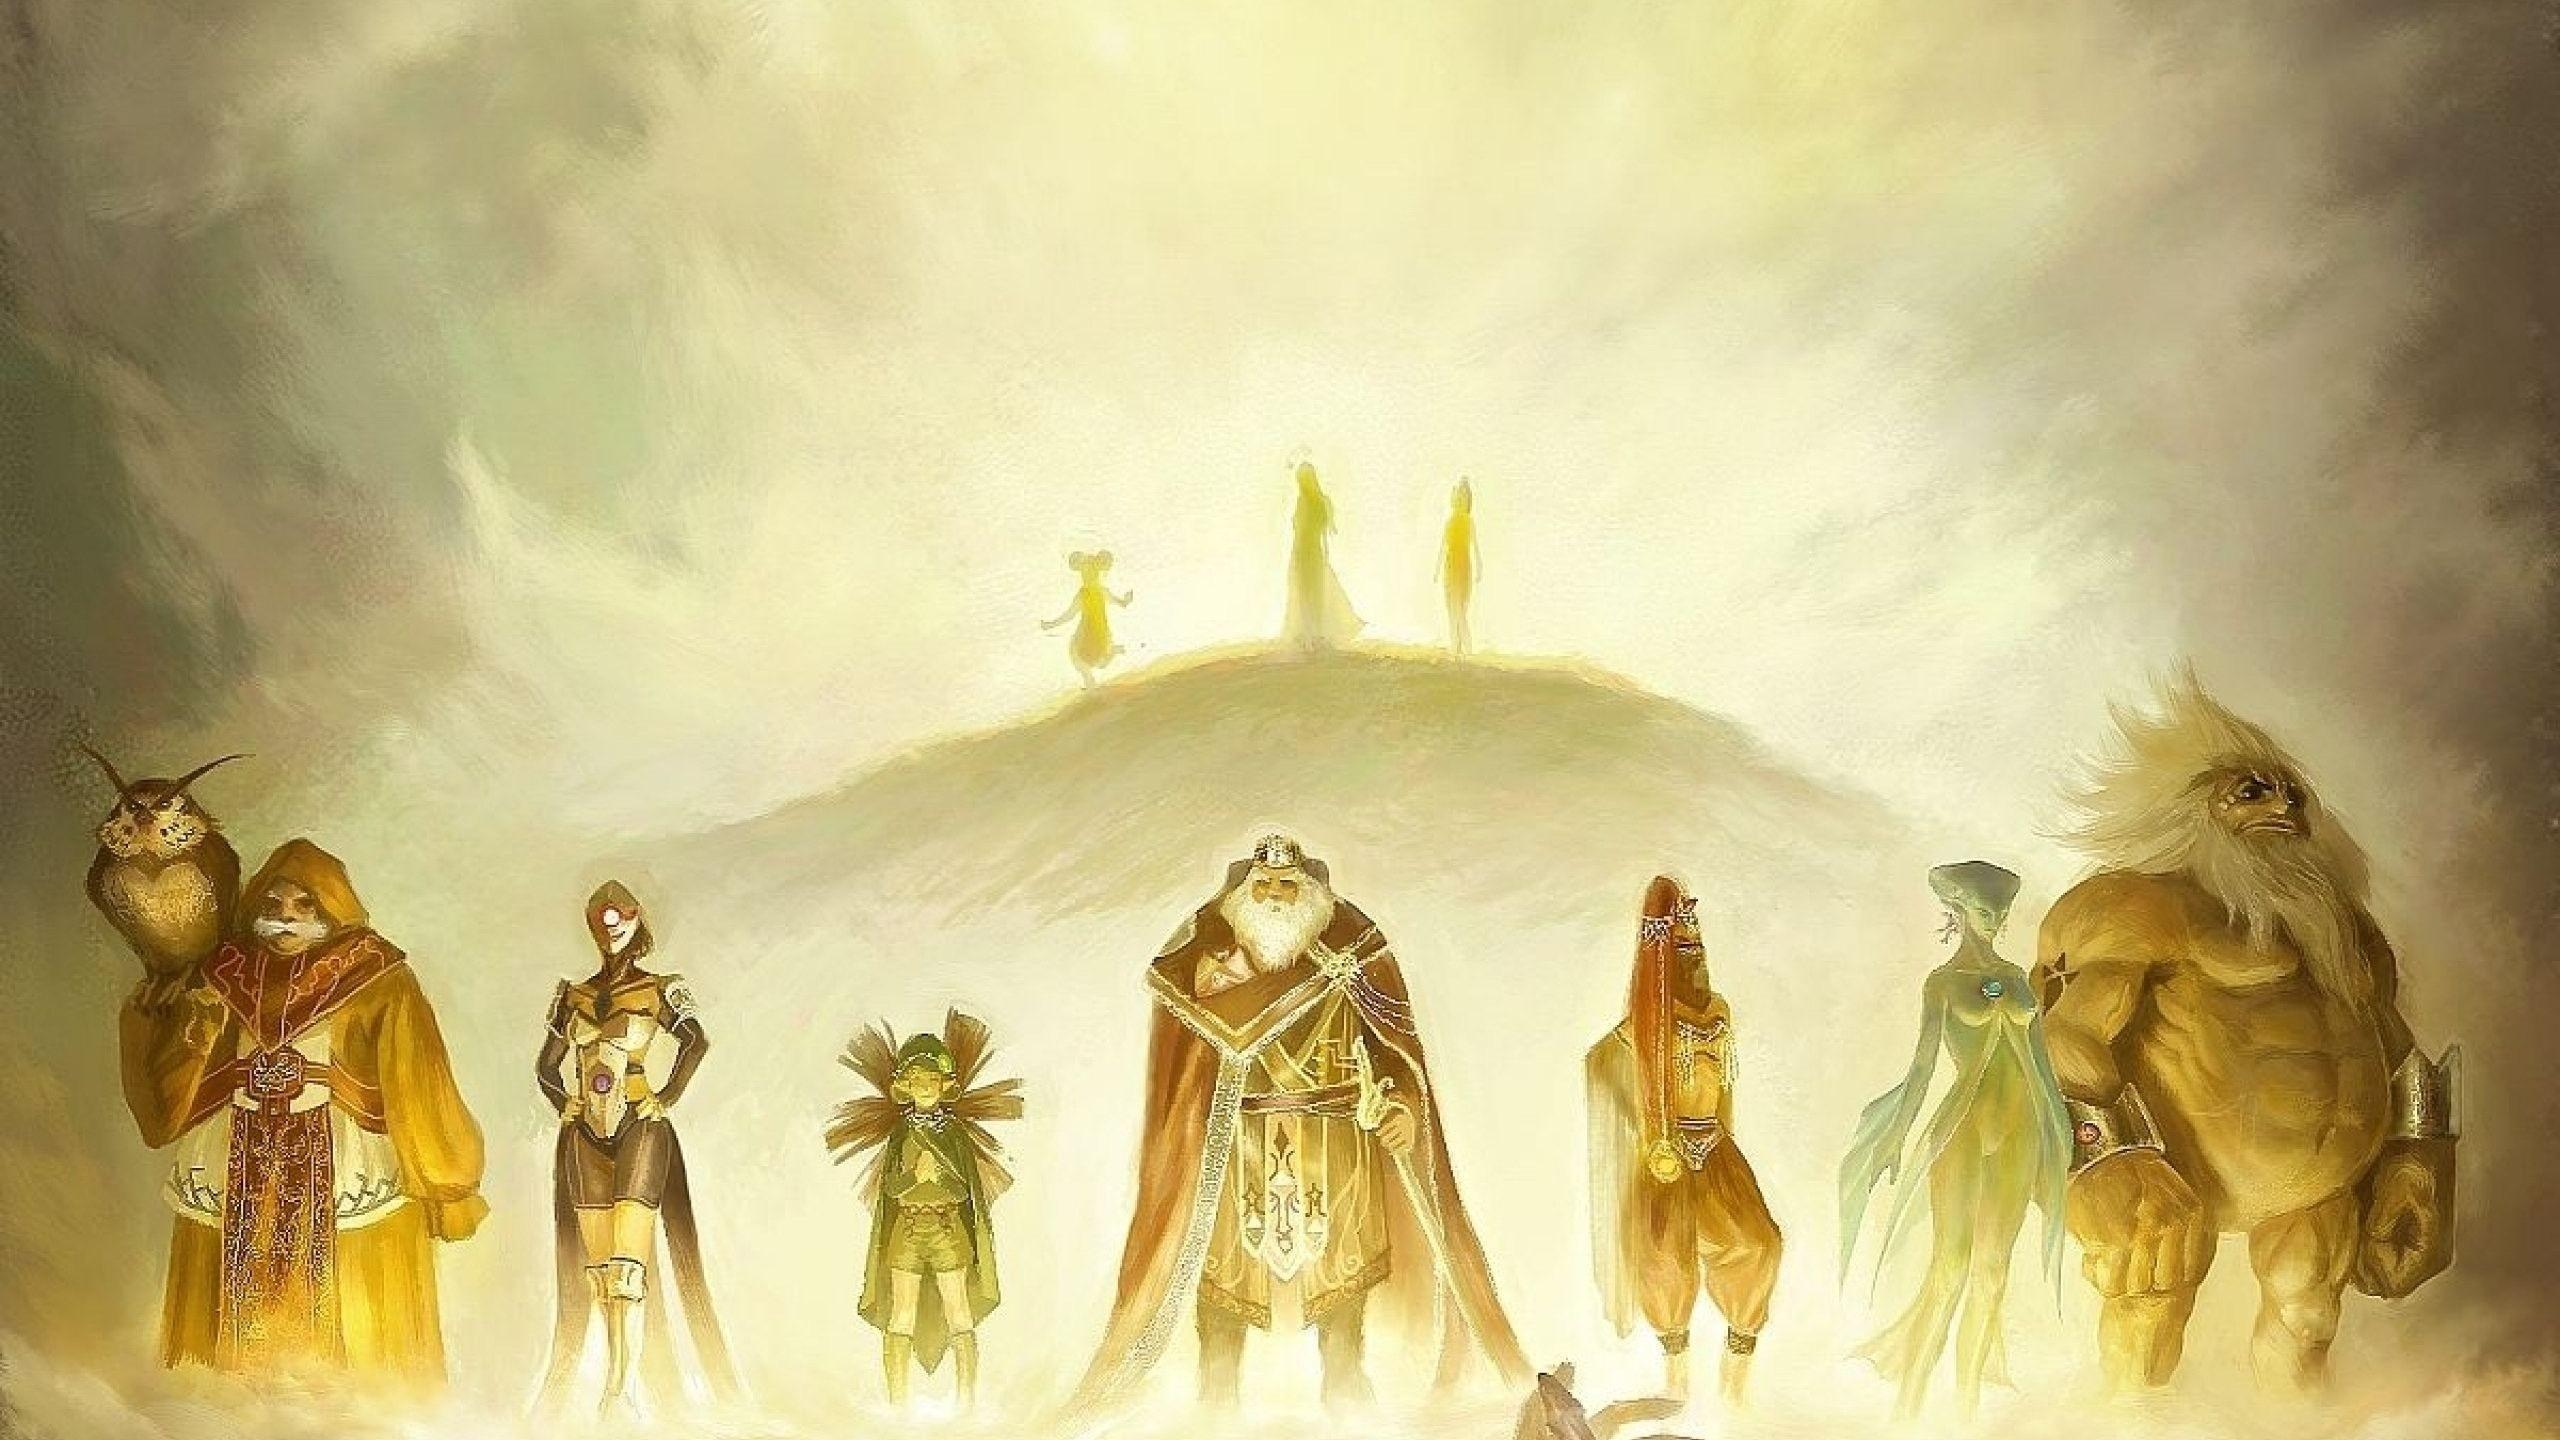 Free Download The Legend Of Zelda Twilight Princess Wallpapers .